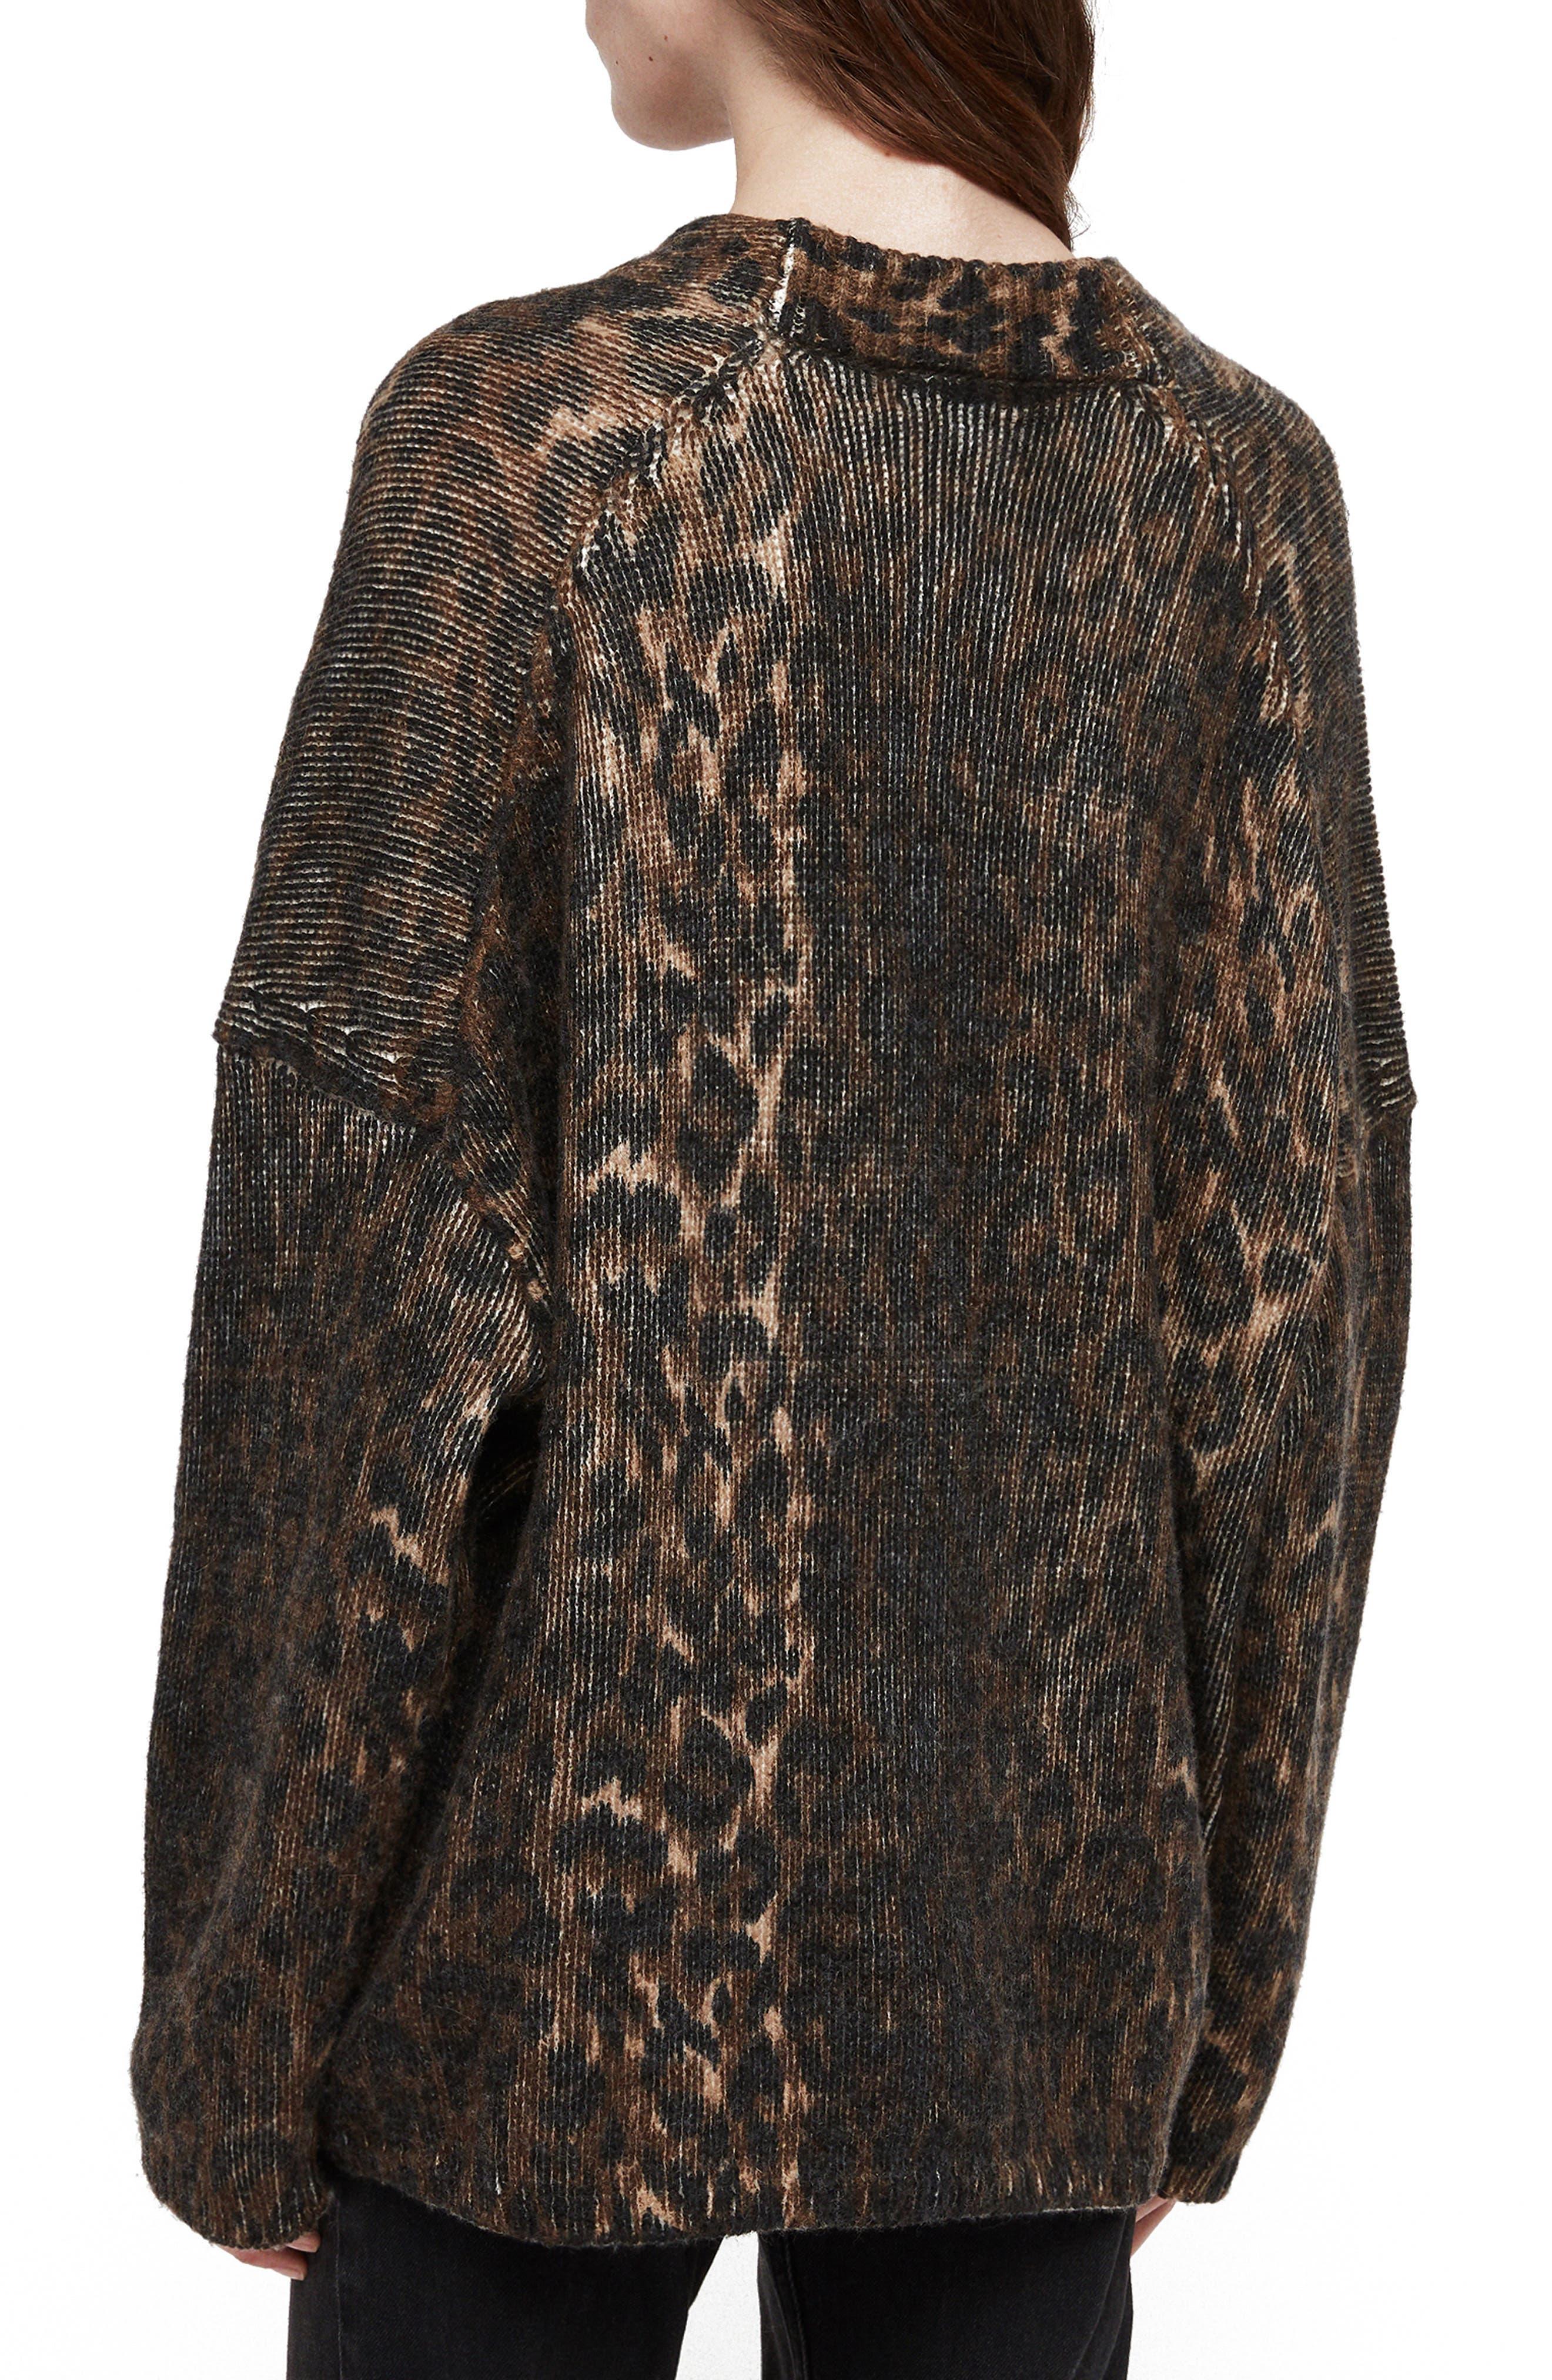 Ph Leopard Wool Blend Cardigan,                             Alternate thumbnail 2, color,                             LEOPARD BROWN